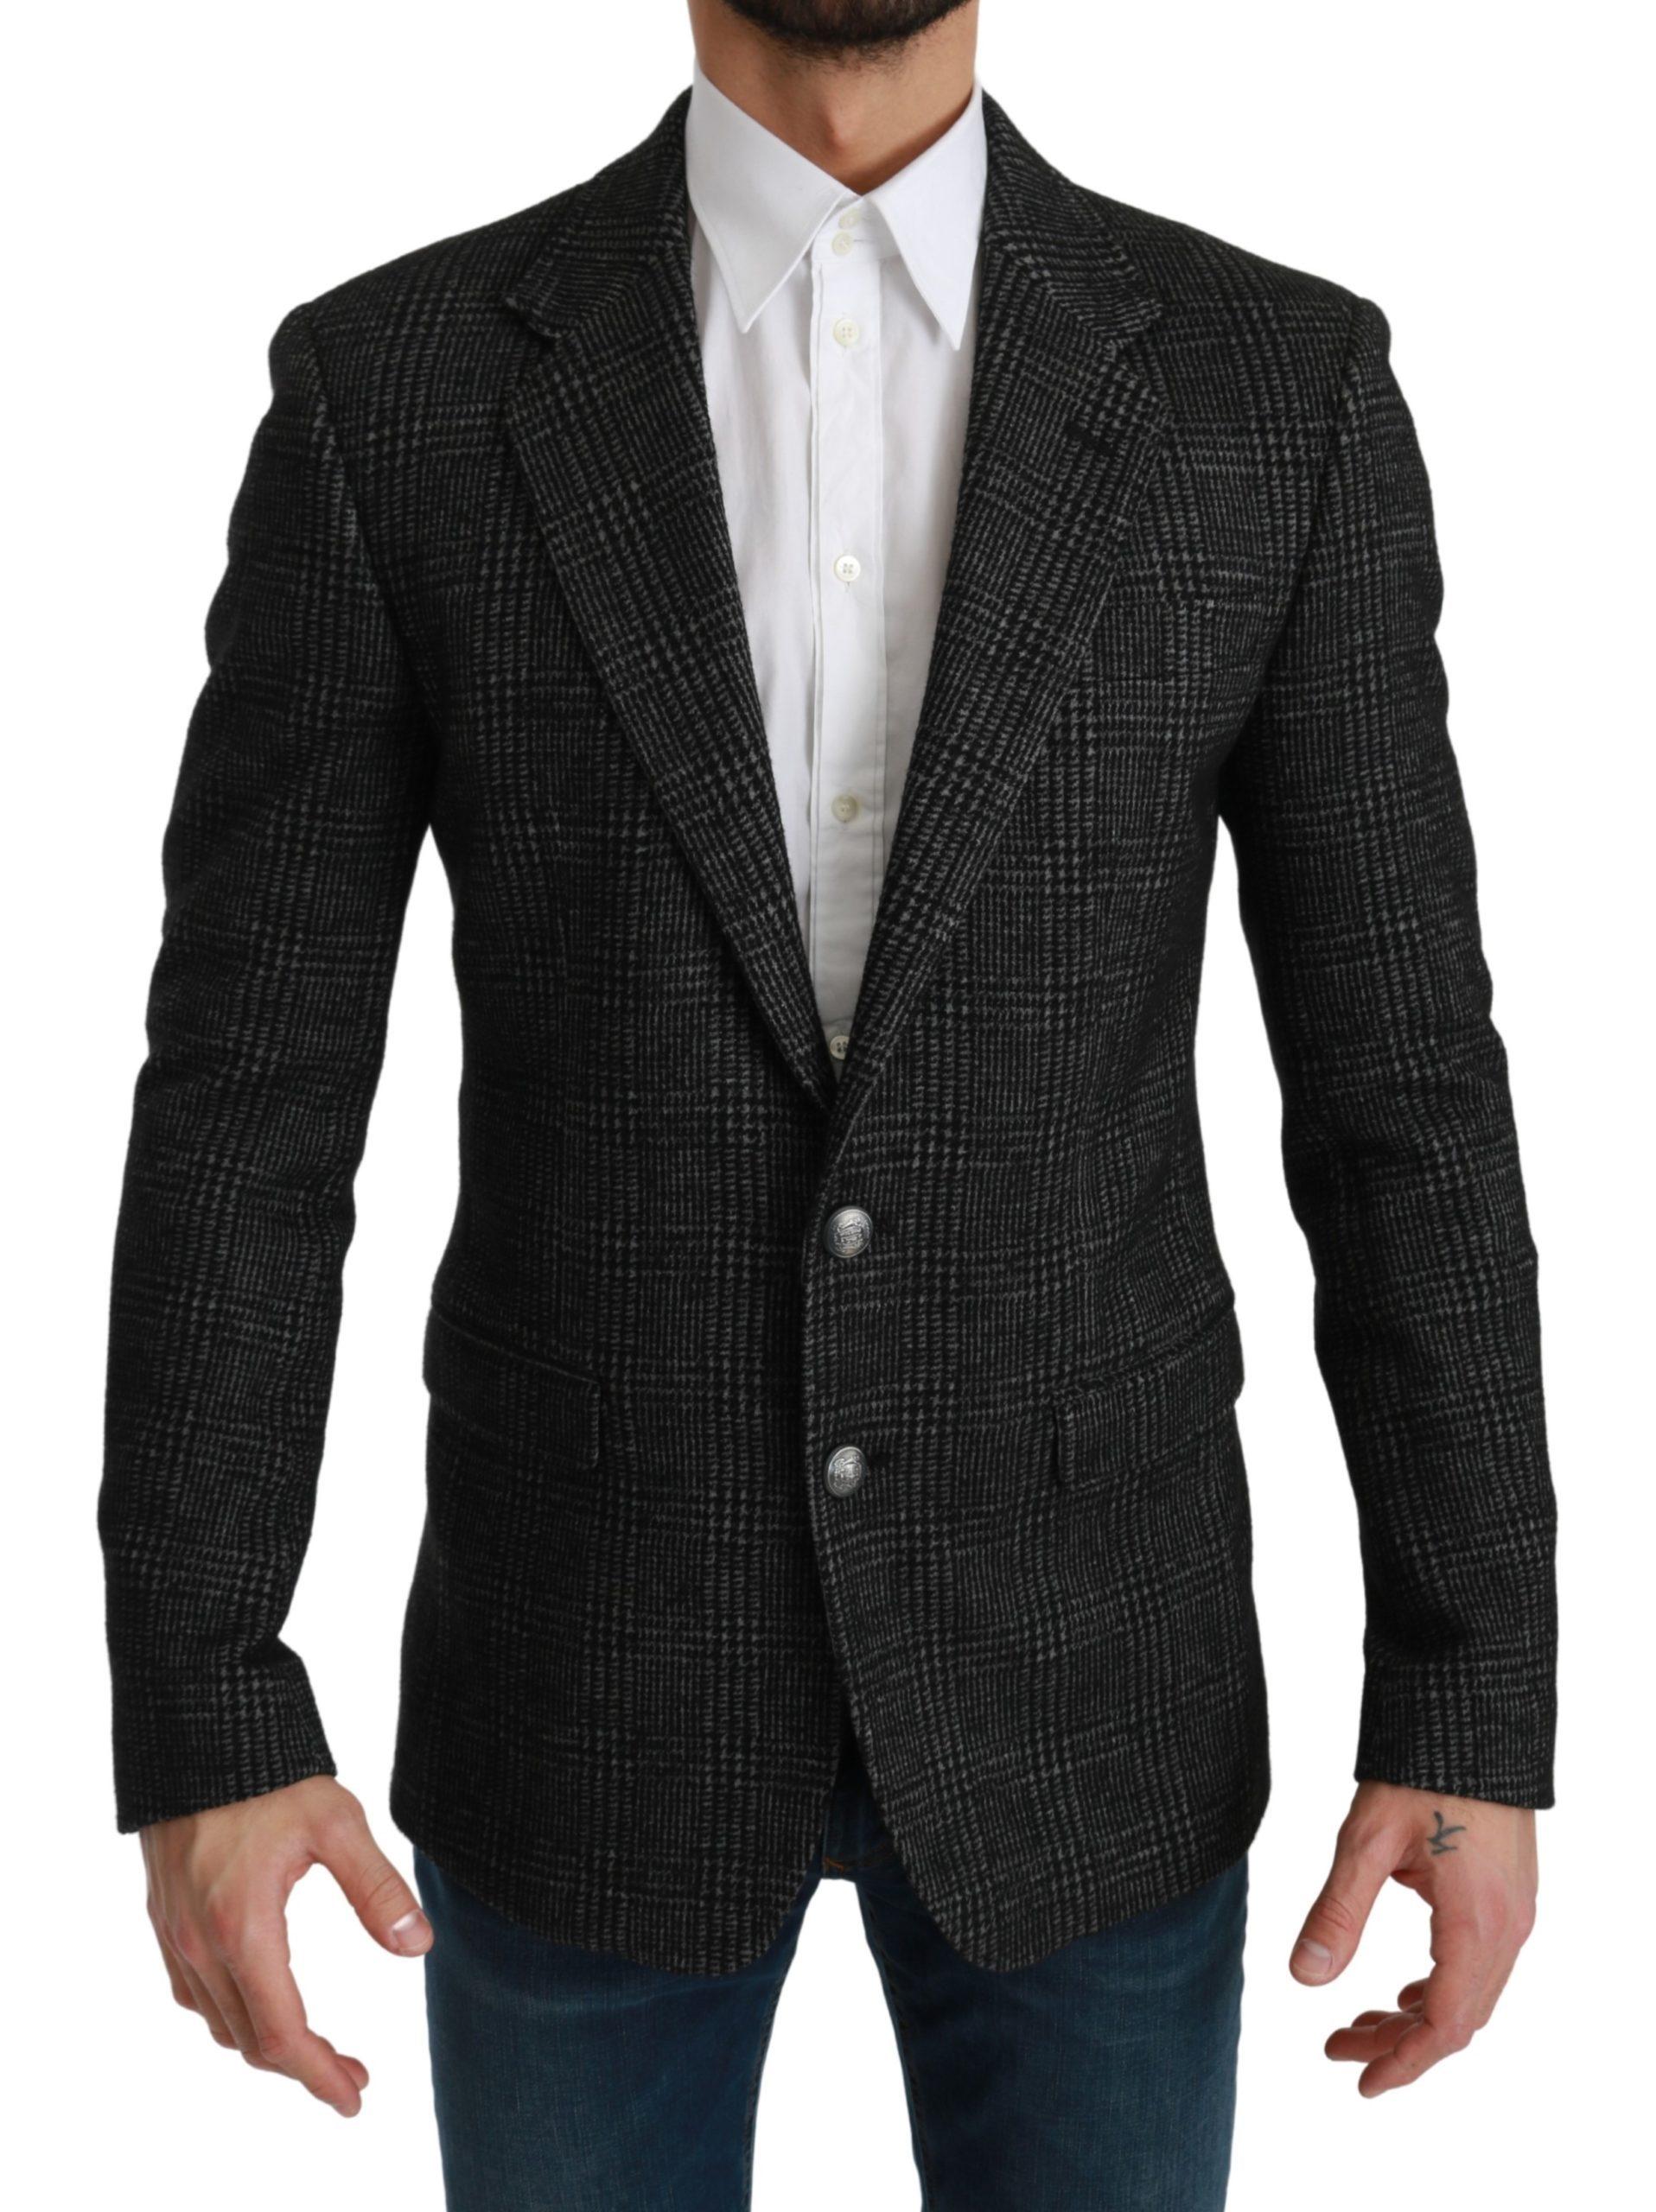 Dolce & Gabbana Men's Plaid Check Slim Fit Blazer Gray KOS1778 - IT46 | S